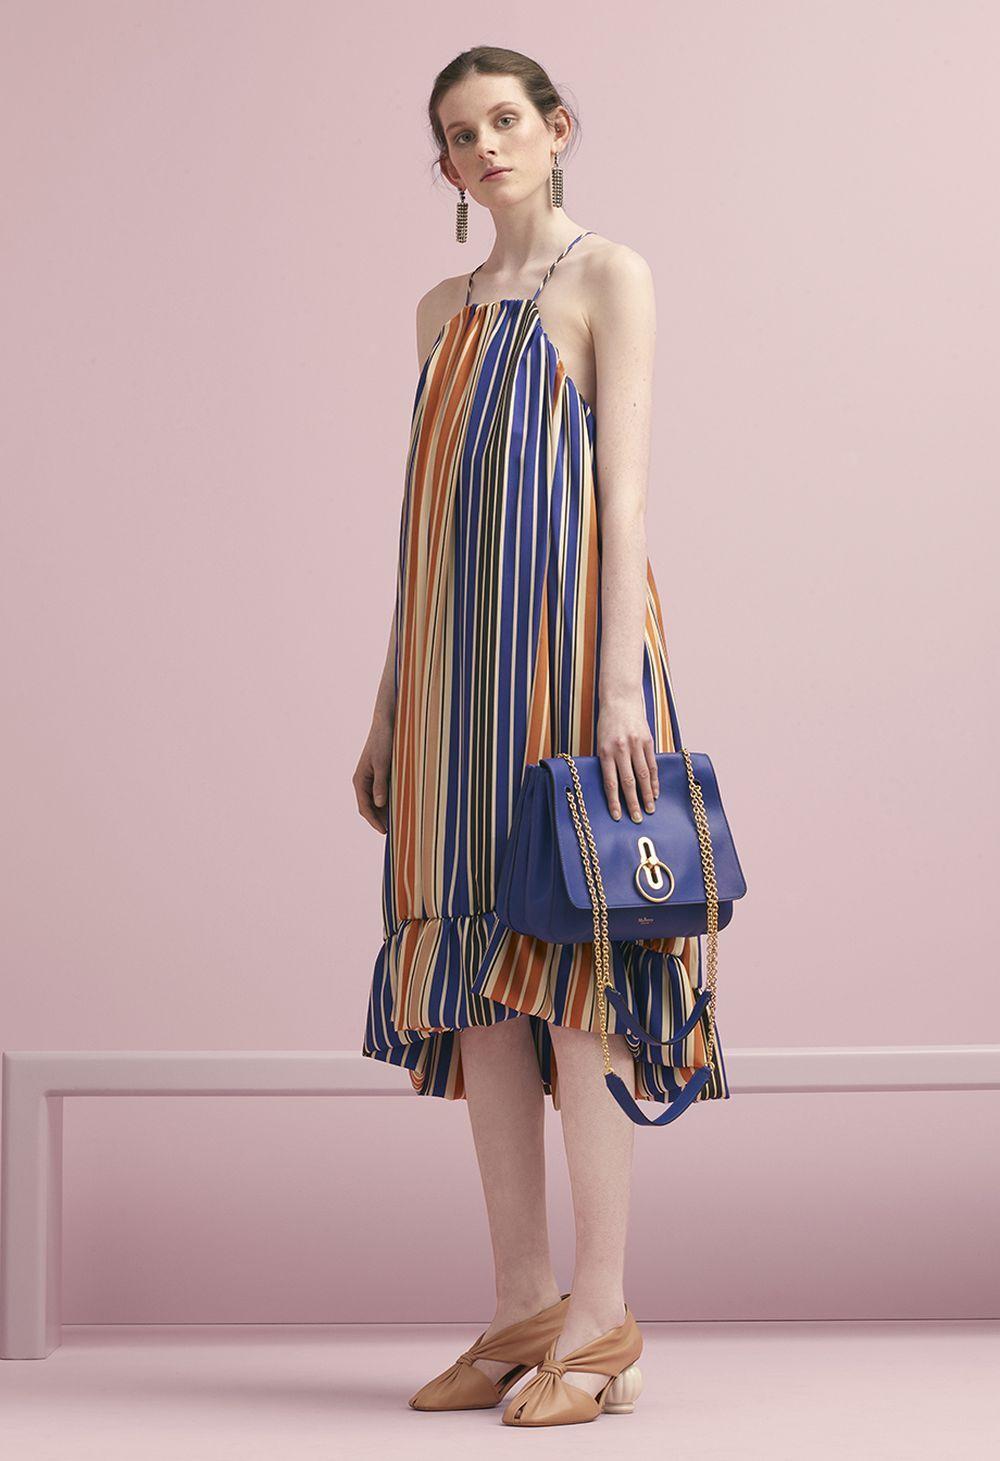 a4b894a716 Mulberry Summer  18 LFW show. Janet Dress in Indigo Stripes Twill ...